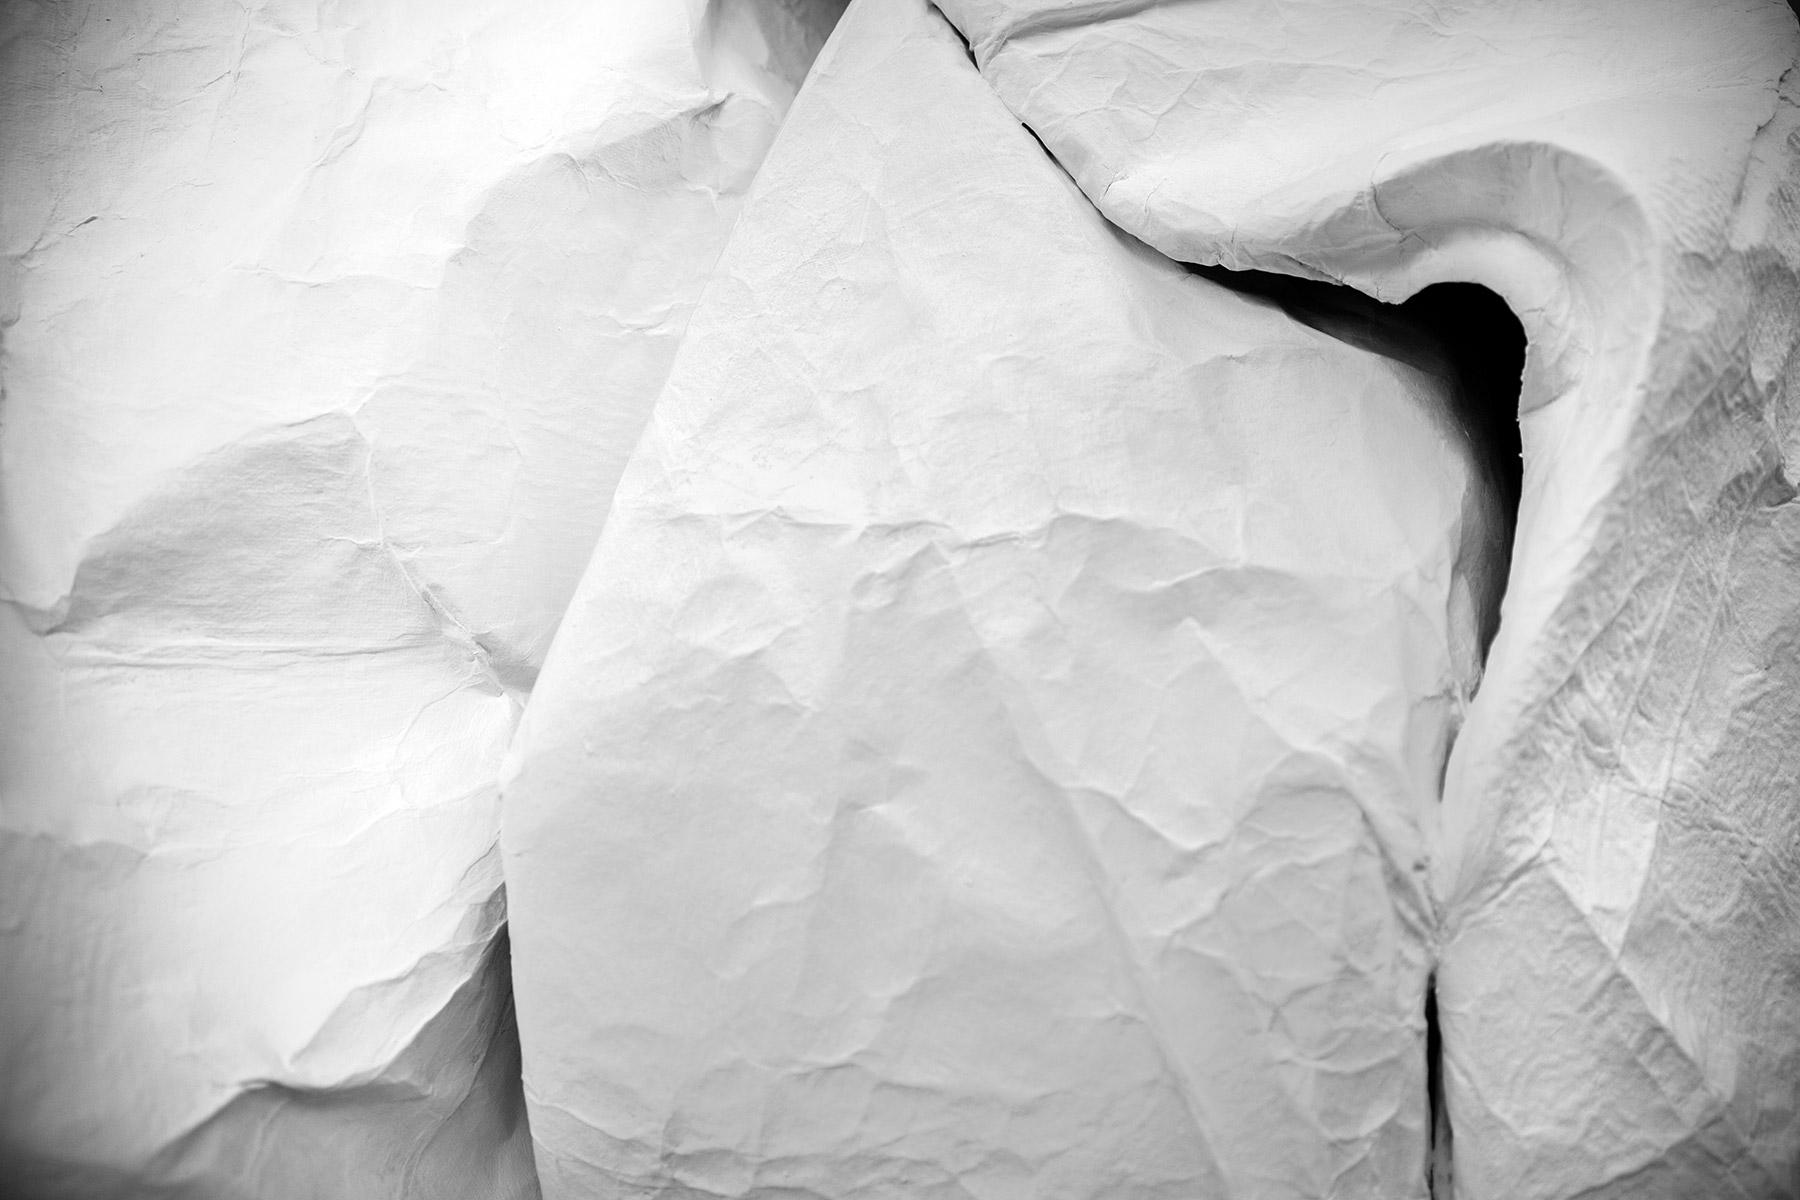 paper-elephant-sipho-mabona-03